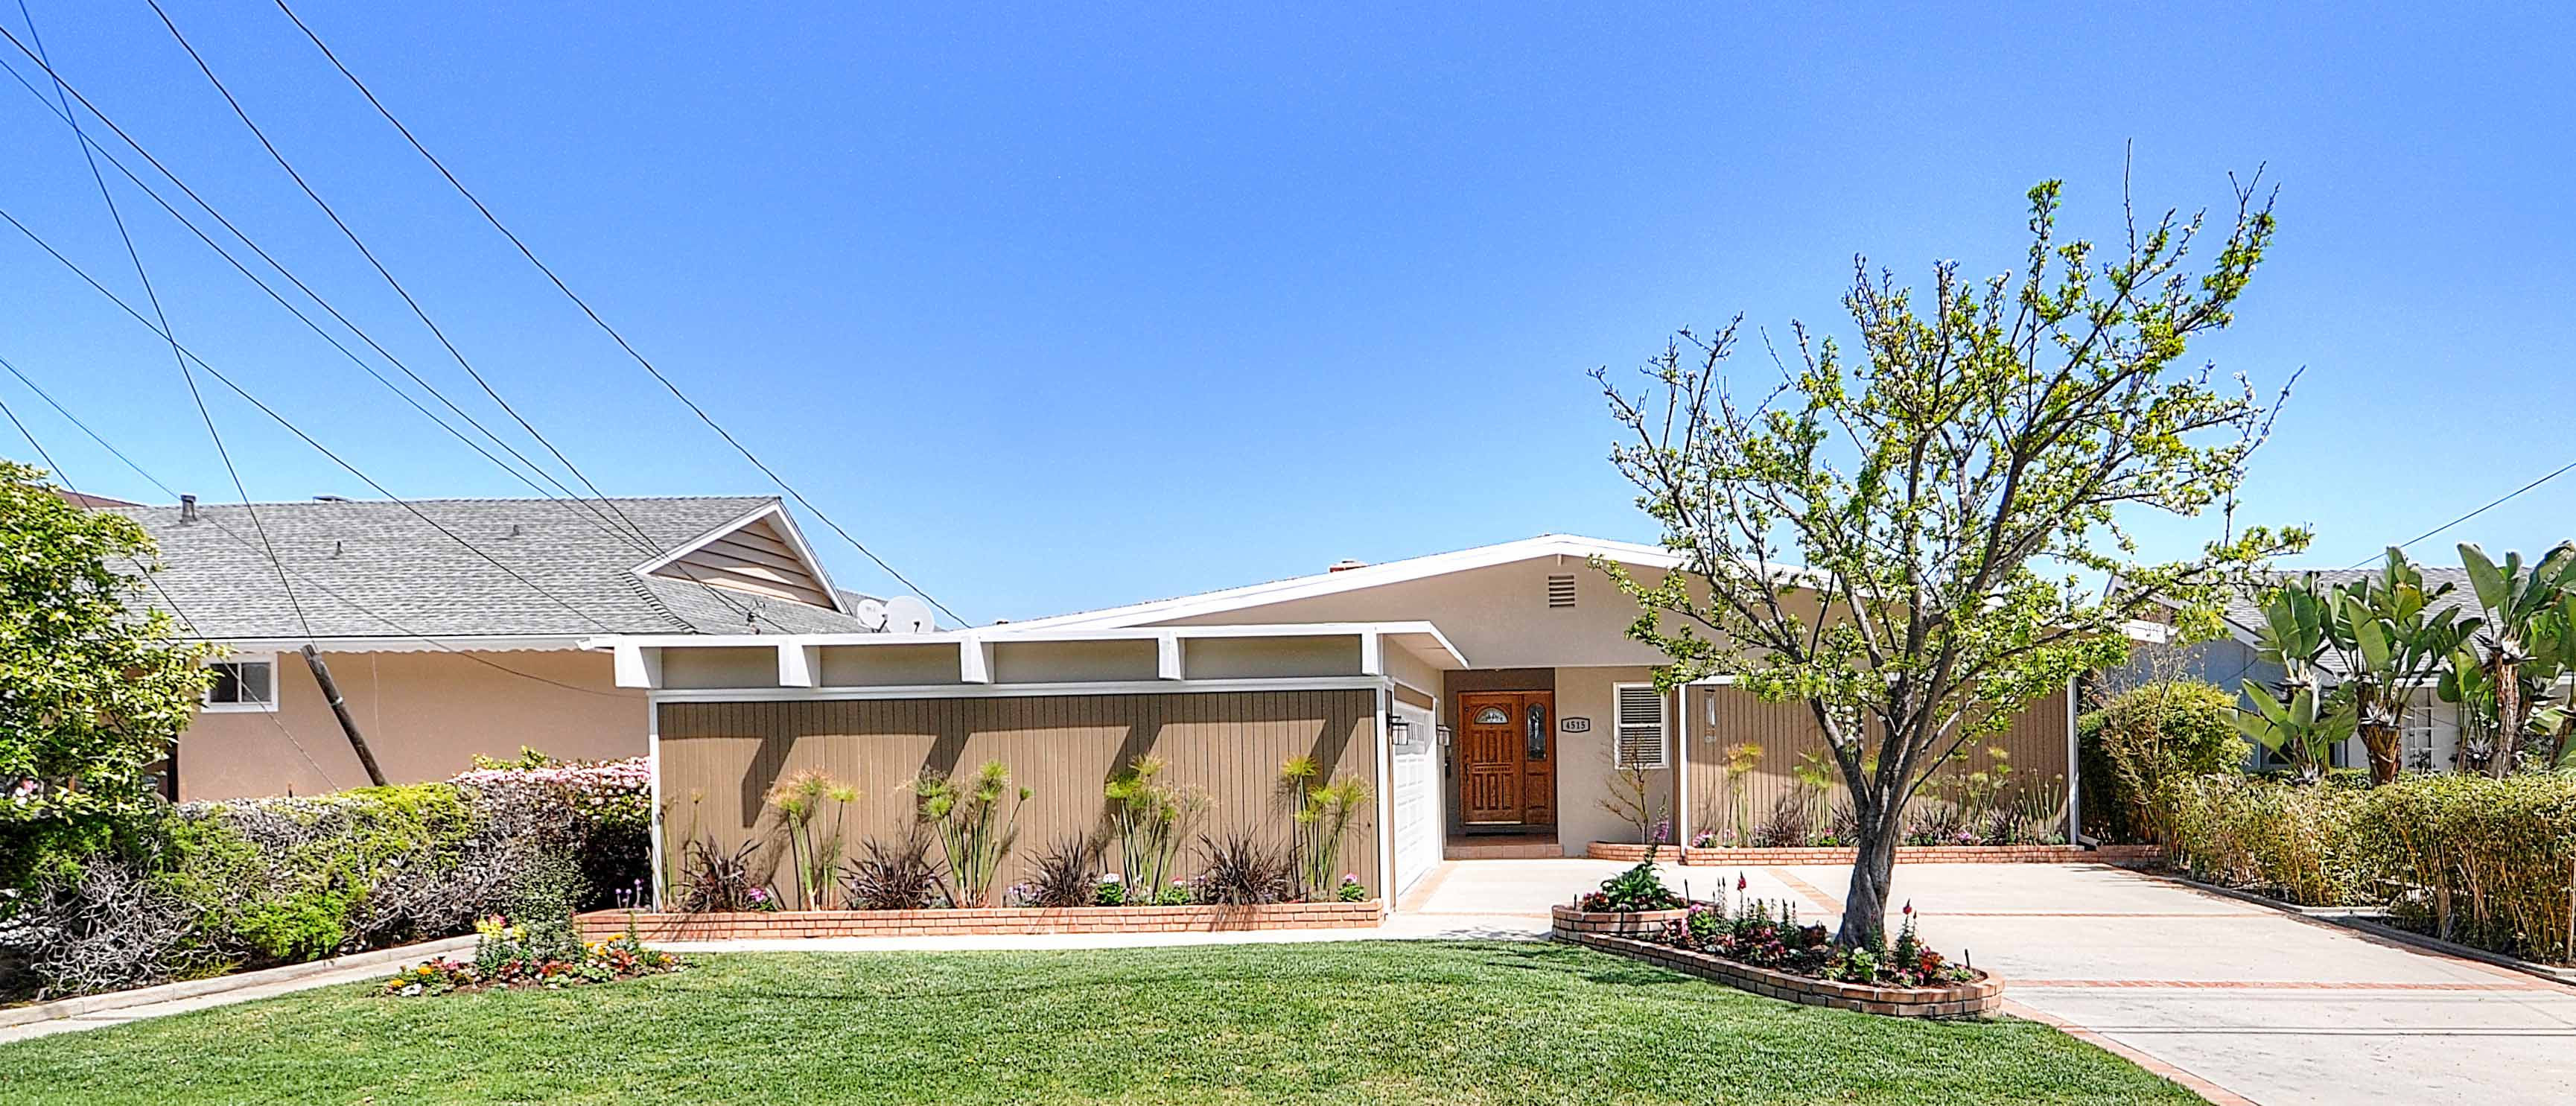 4515-Vista-Largo-front-of-house3-Copy